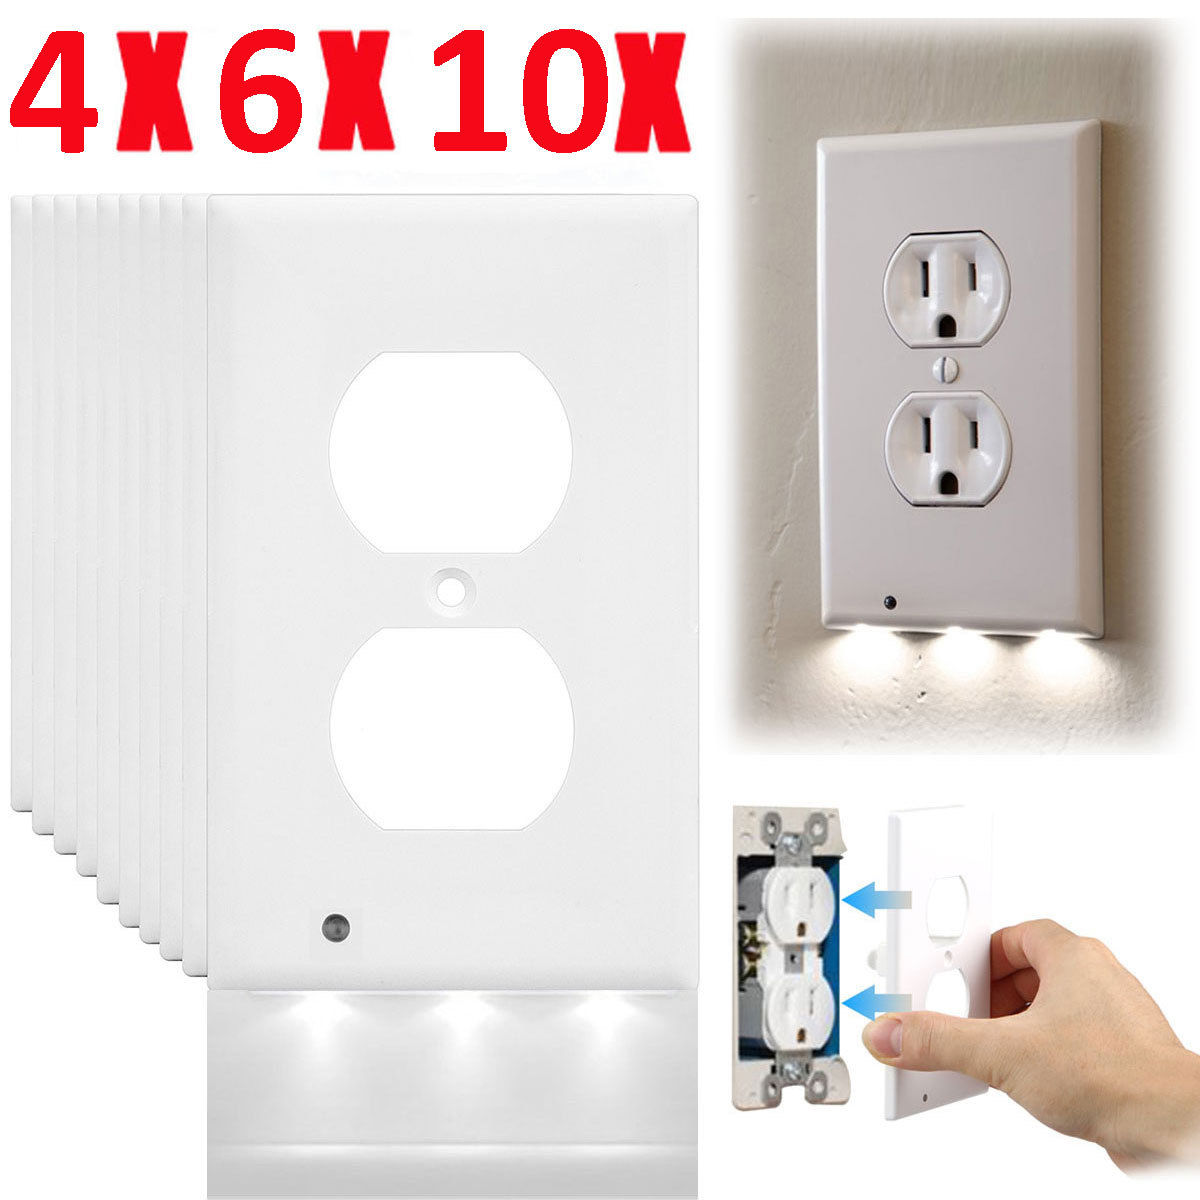 Light And Plug Covers Lot Plug Cover Led Light Sensor Night Light Wall Outlet Face